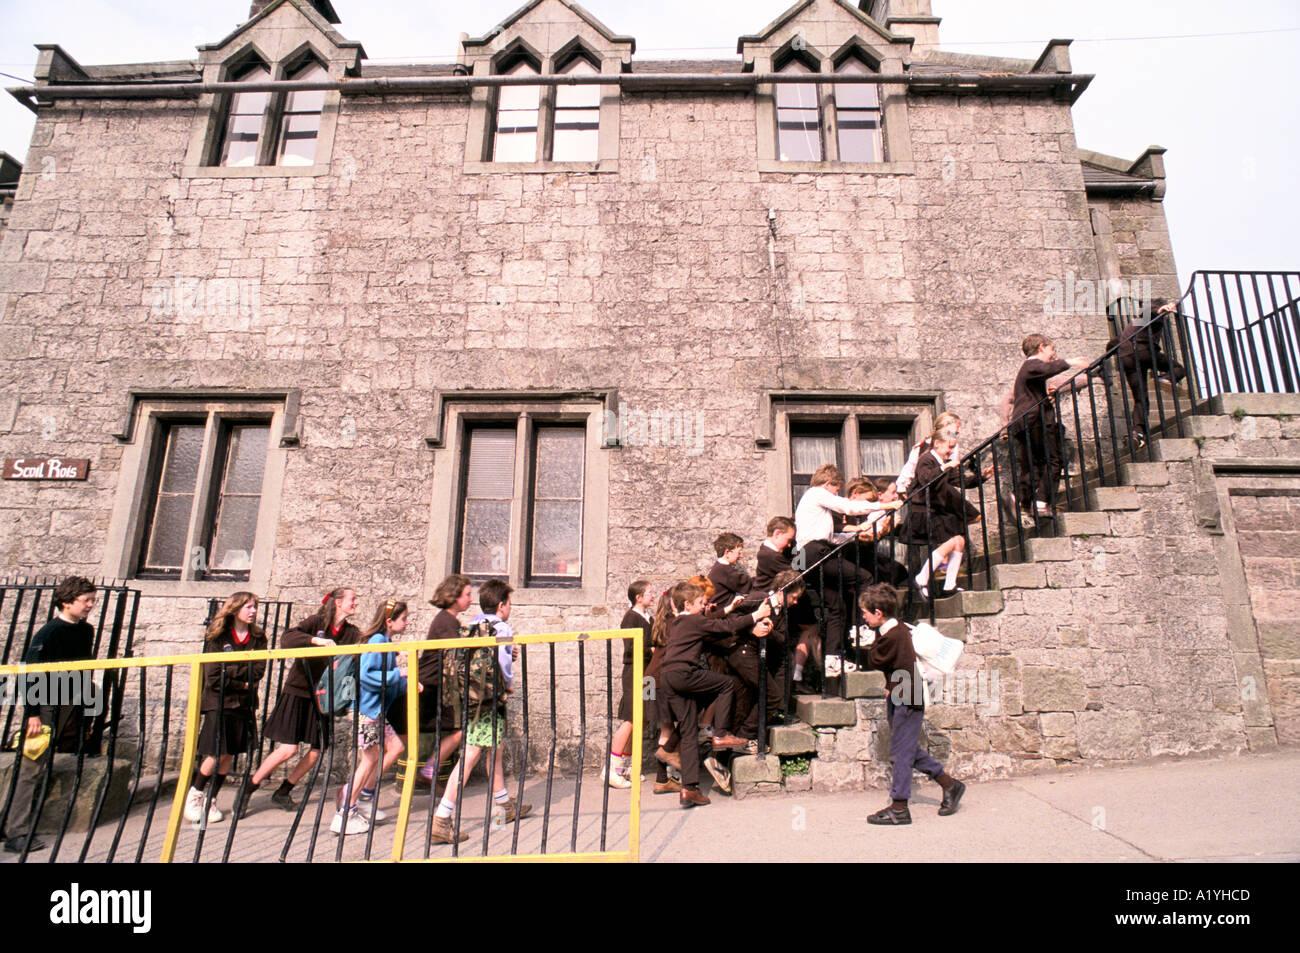 Carrickmacross, Ireland Party Events | Eventbrite